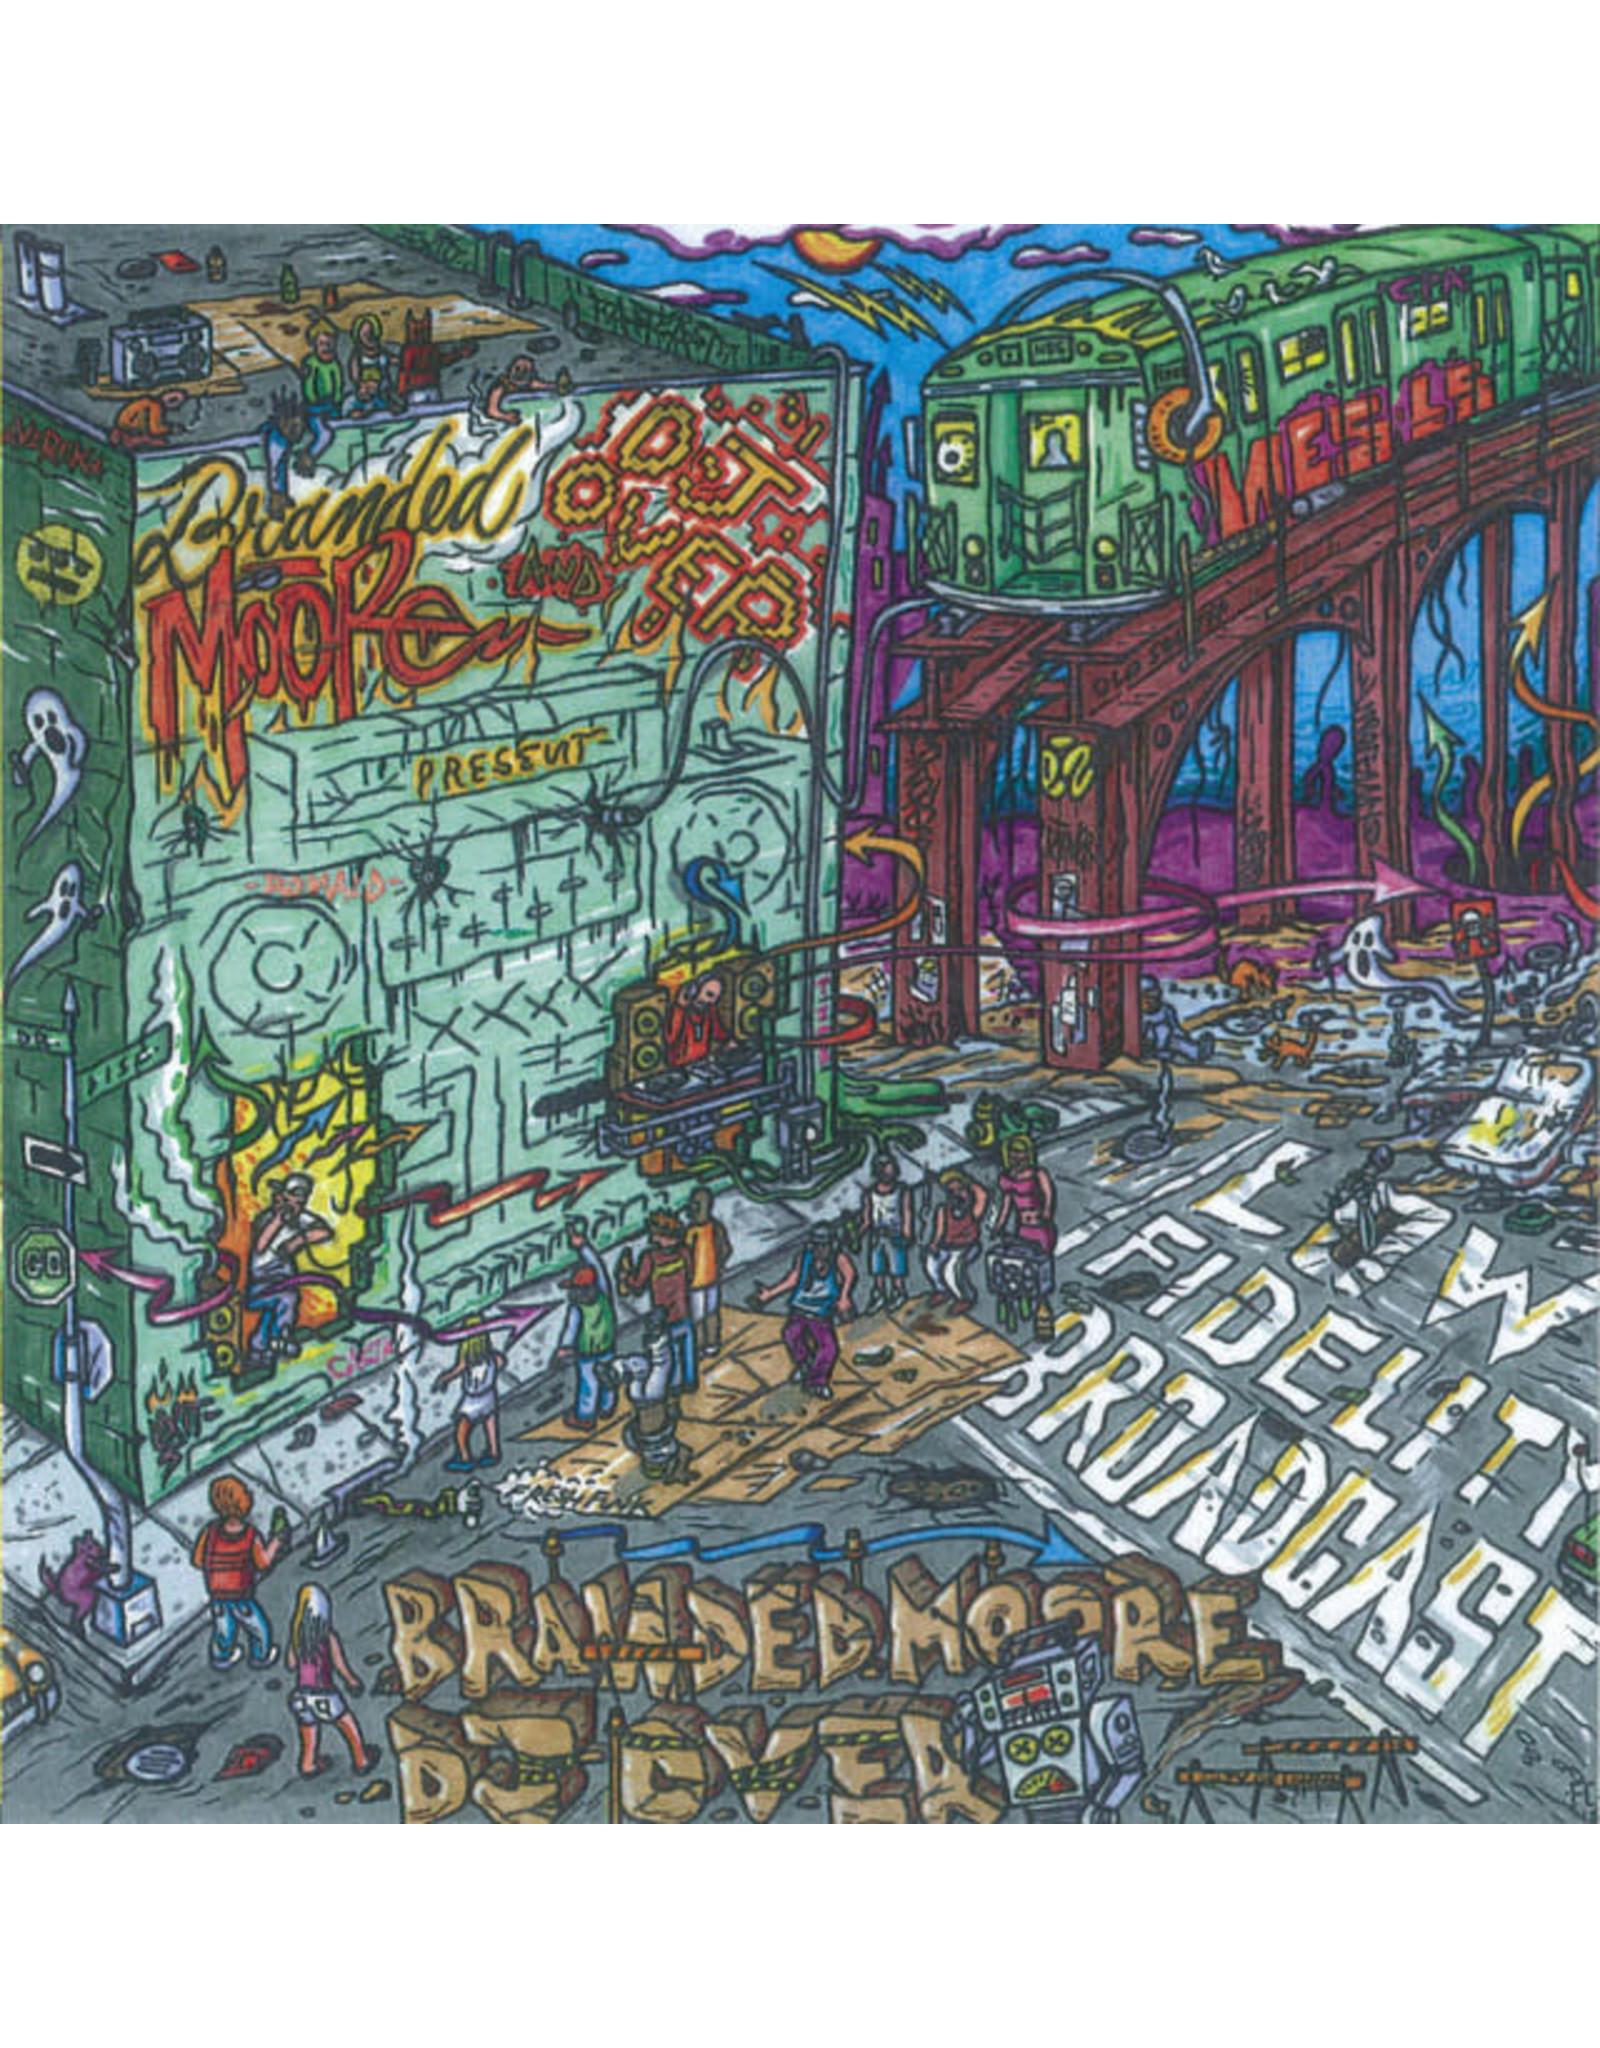 Branded Moore - Low Fidelity Broadcast CD